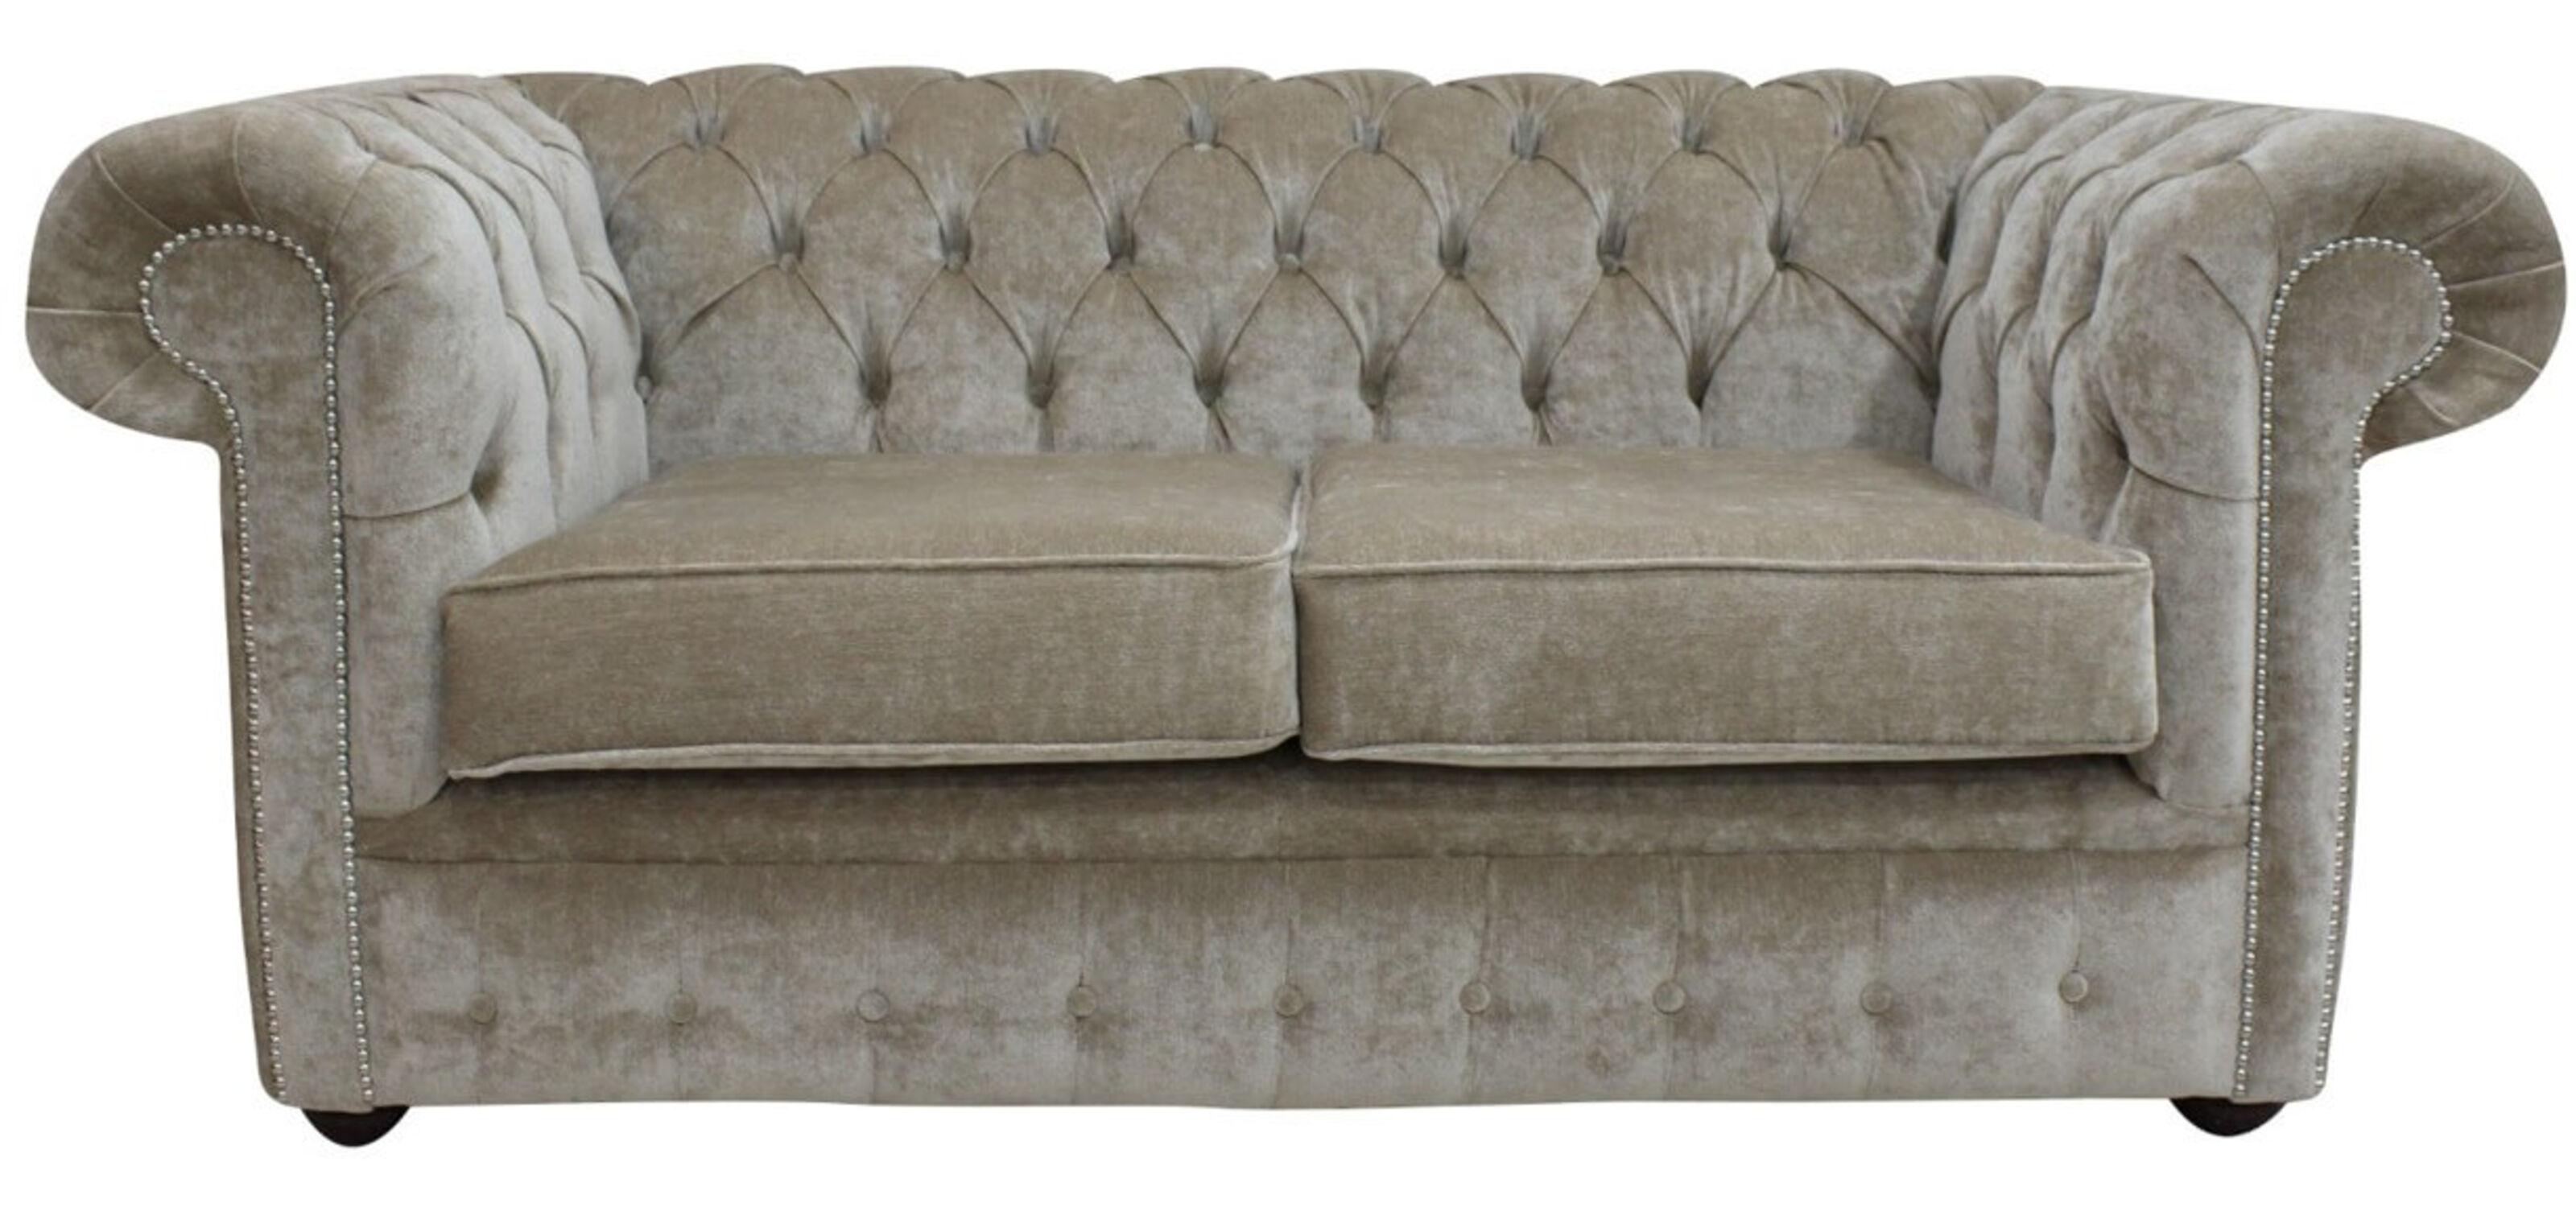 Designersofas4u 2 Seater Chiffon Velvet Chesterfield Sofa Uk